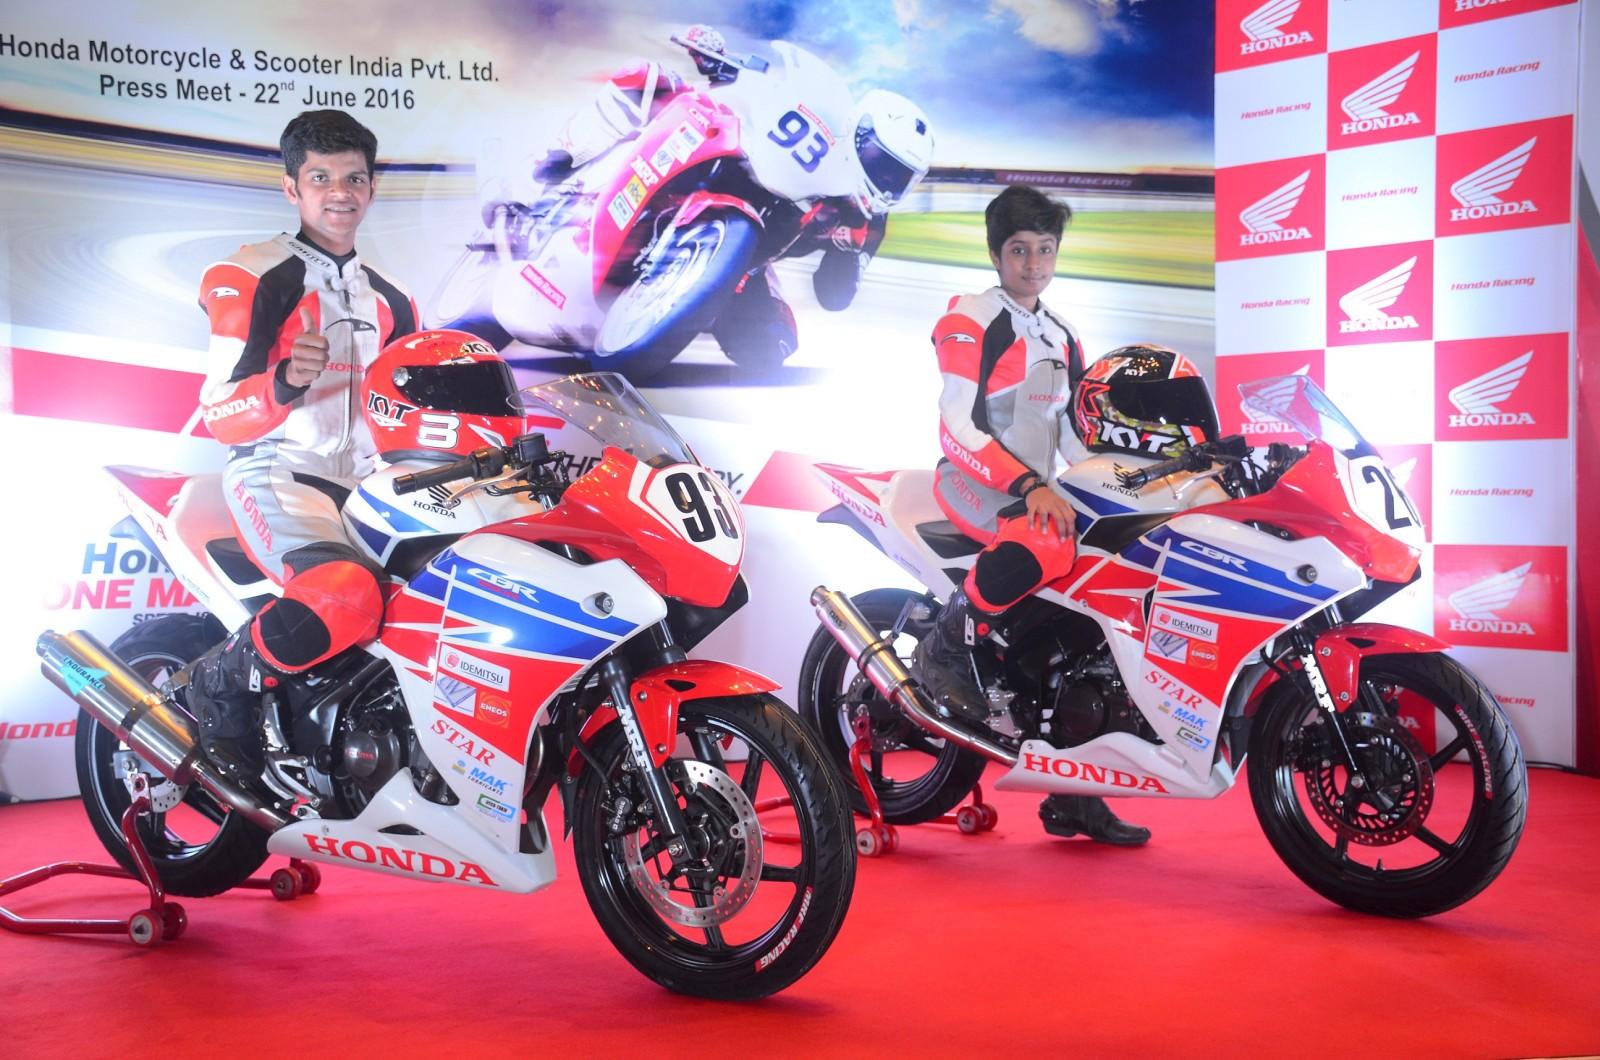 Honda kicks-off 2016 motorsports season (2)